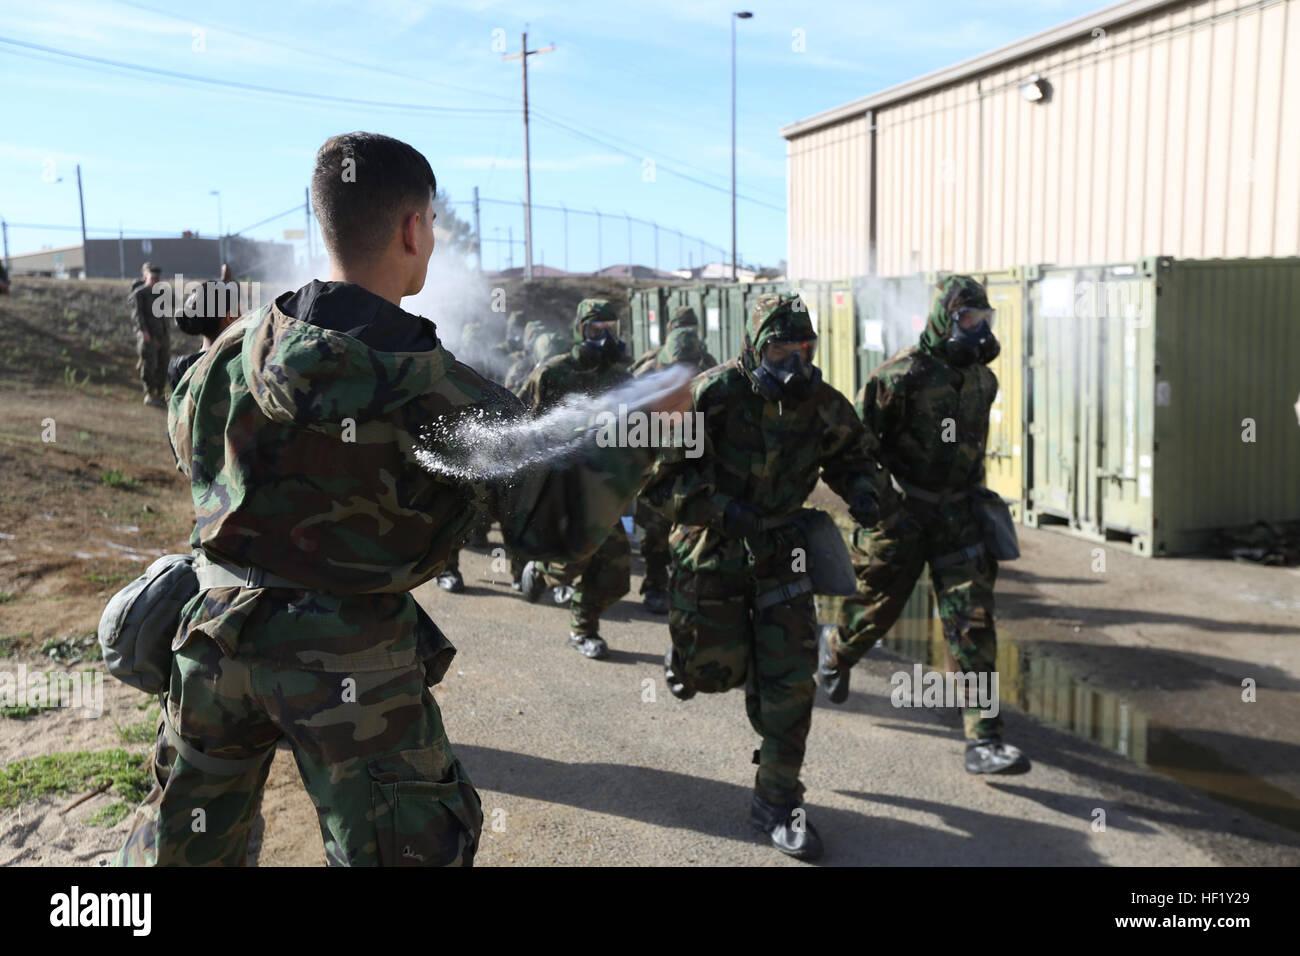 U.S. Marines with Combat Logistics Battalion 1, 1st Marine Logistics Group conduct a Reconnaissance Surveillance - Stock Image